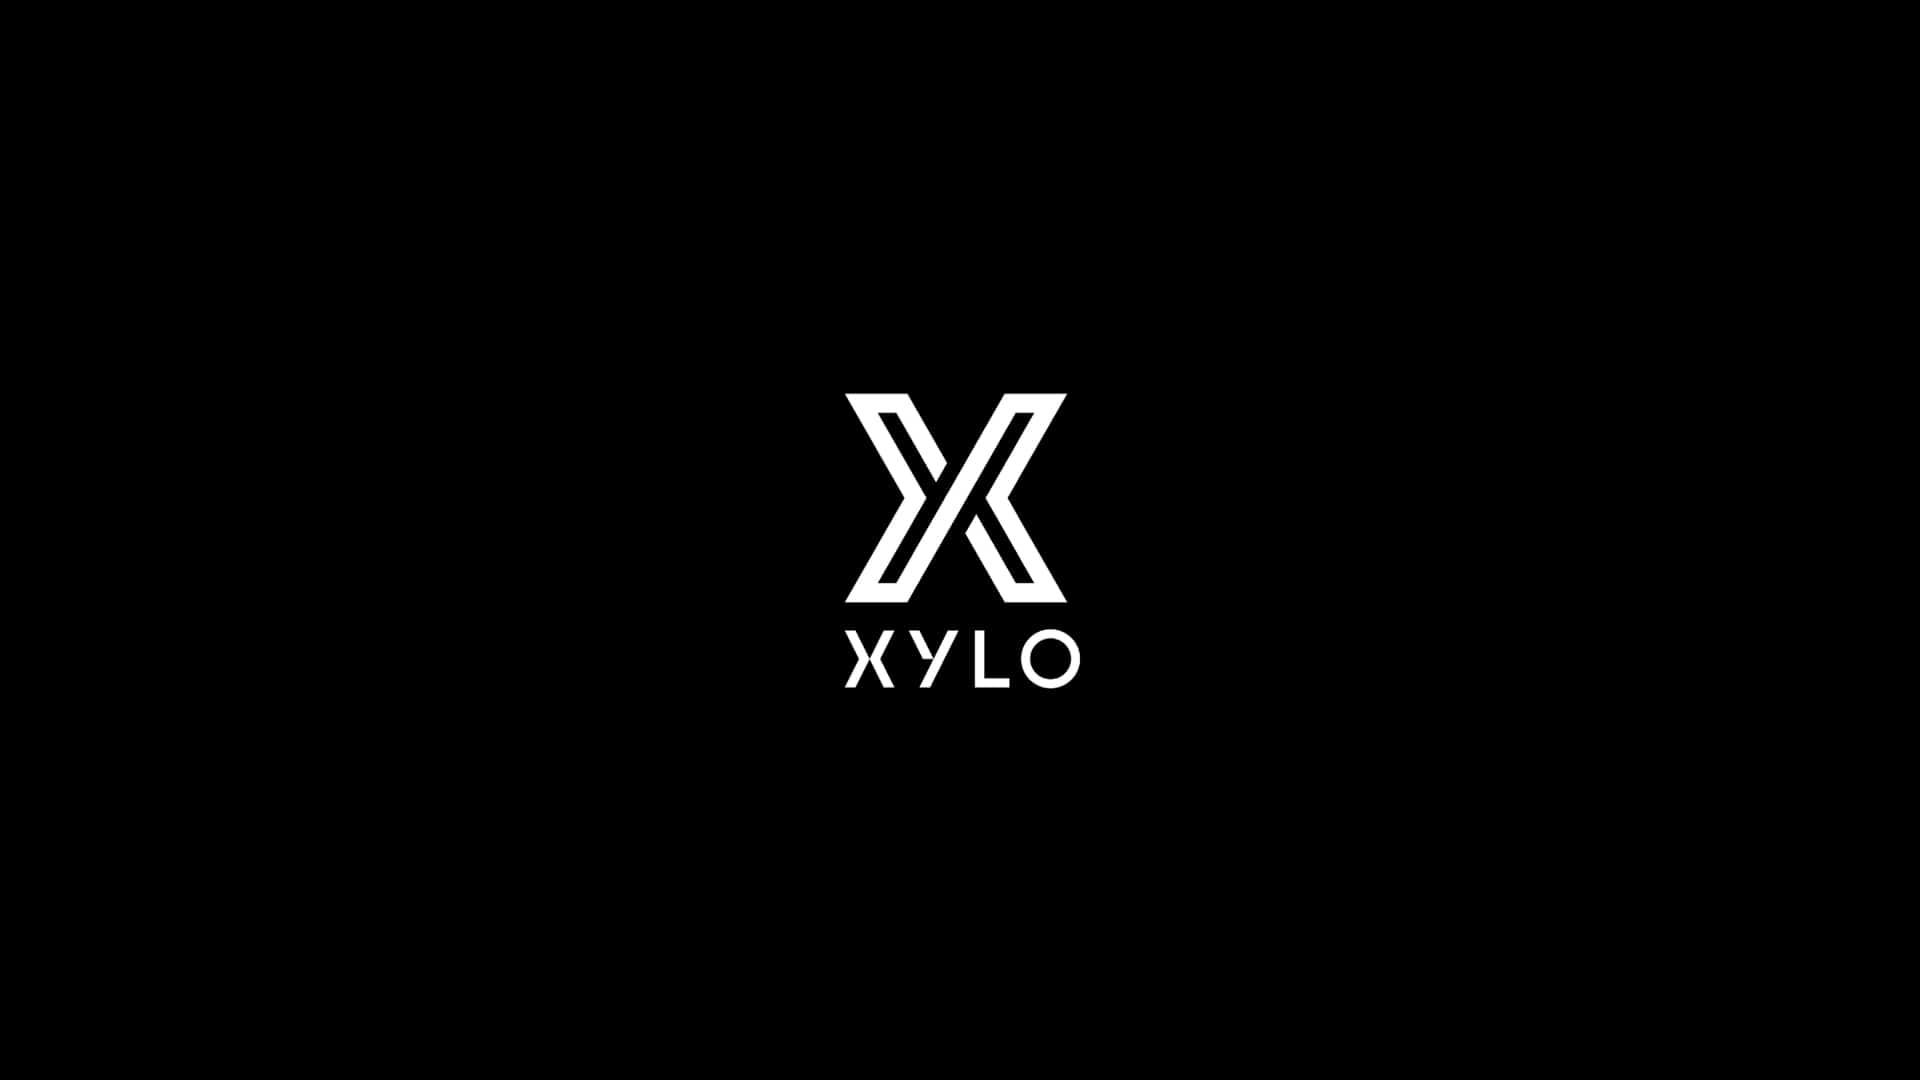 Xylo At The Palace